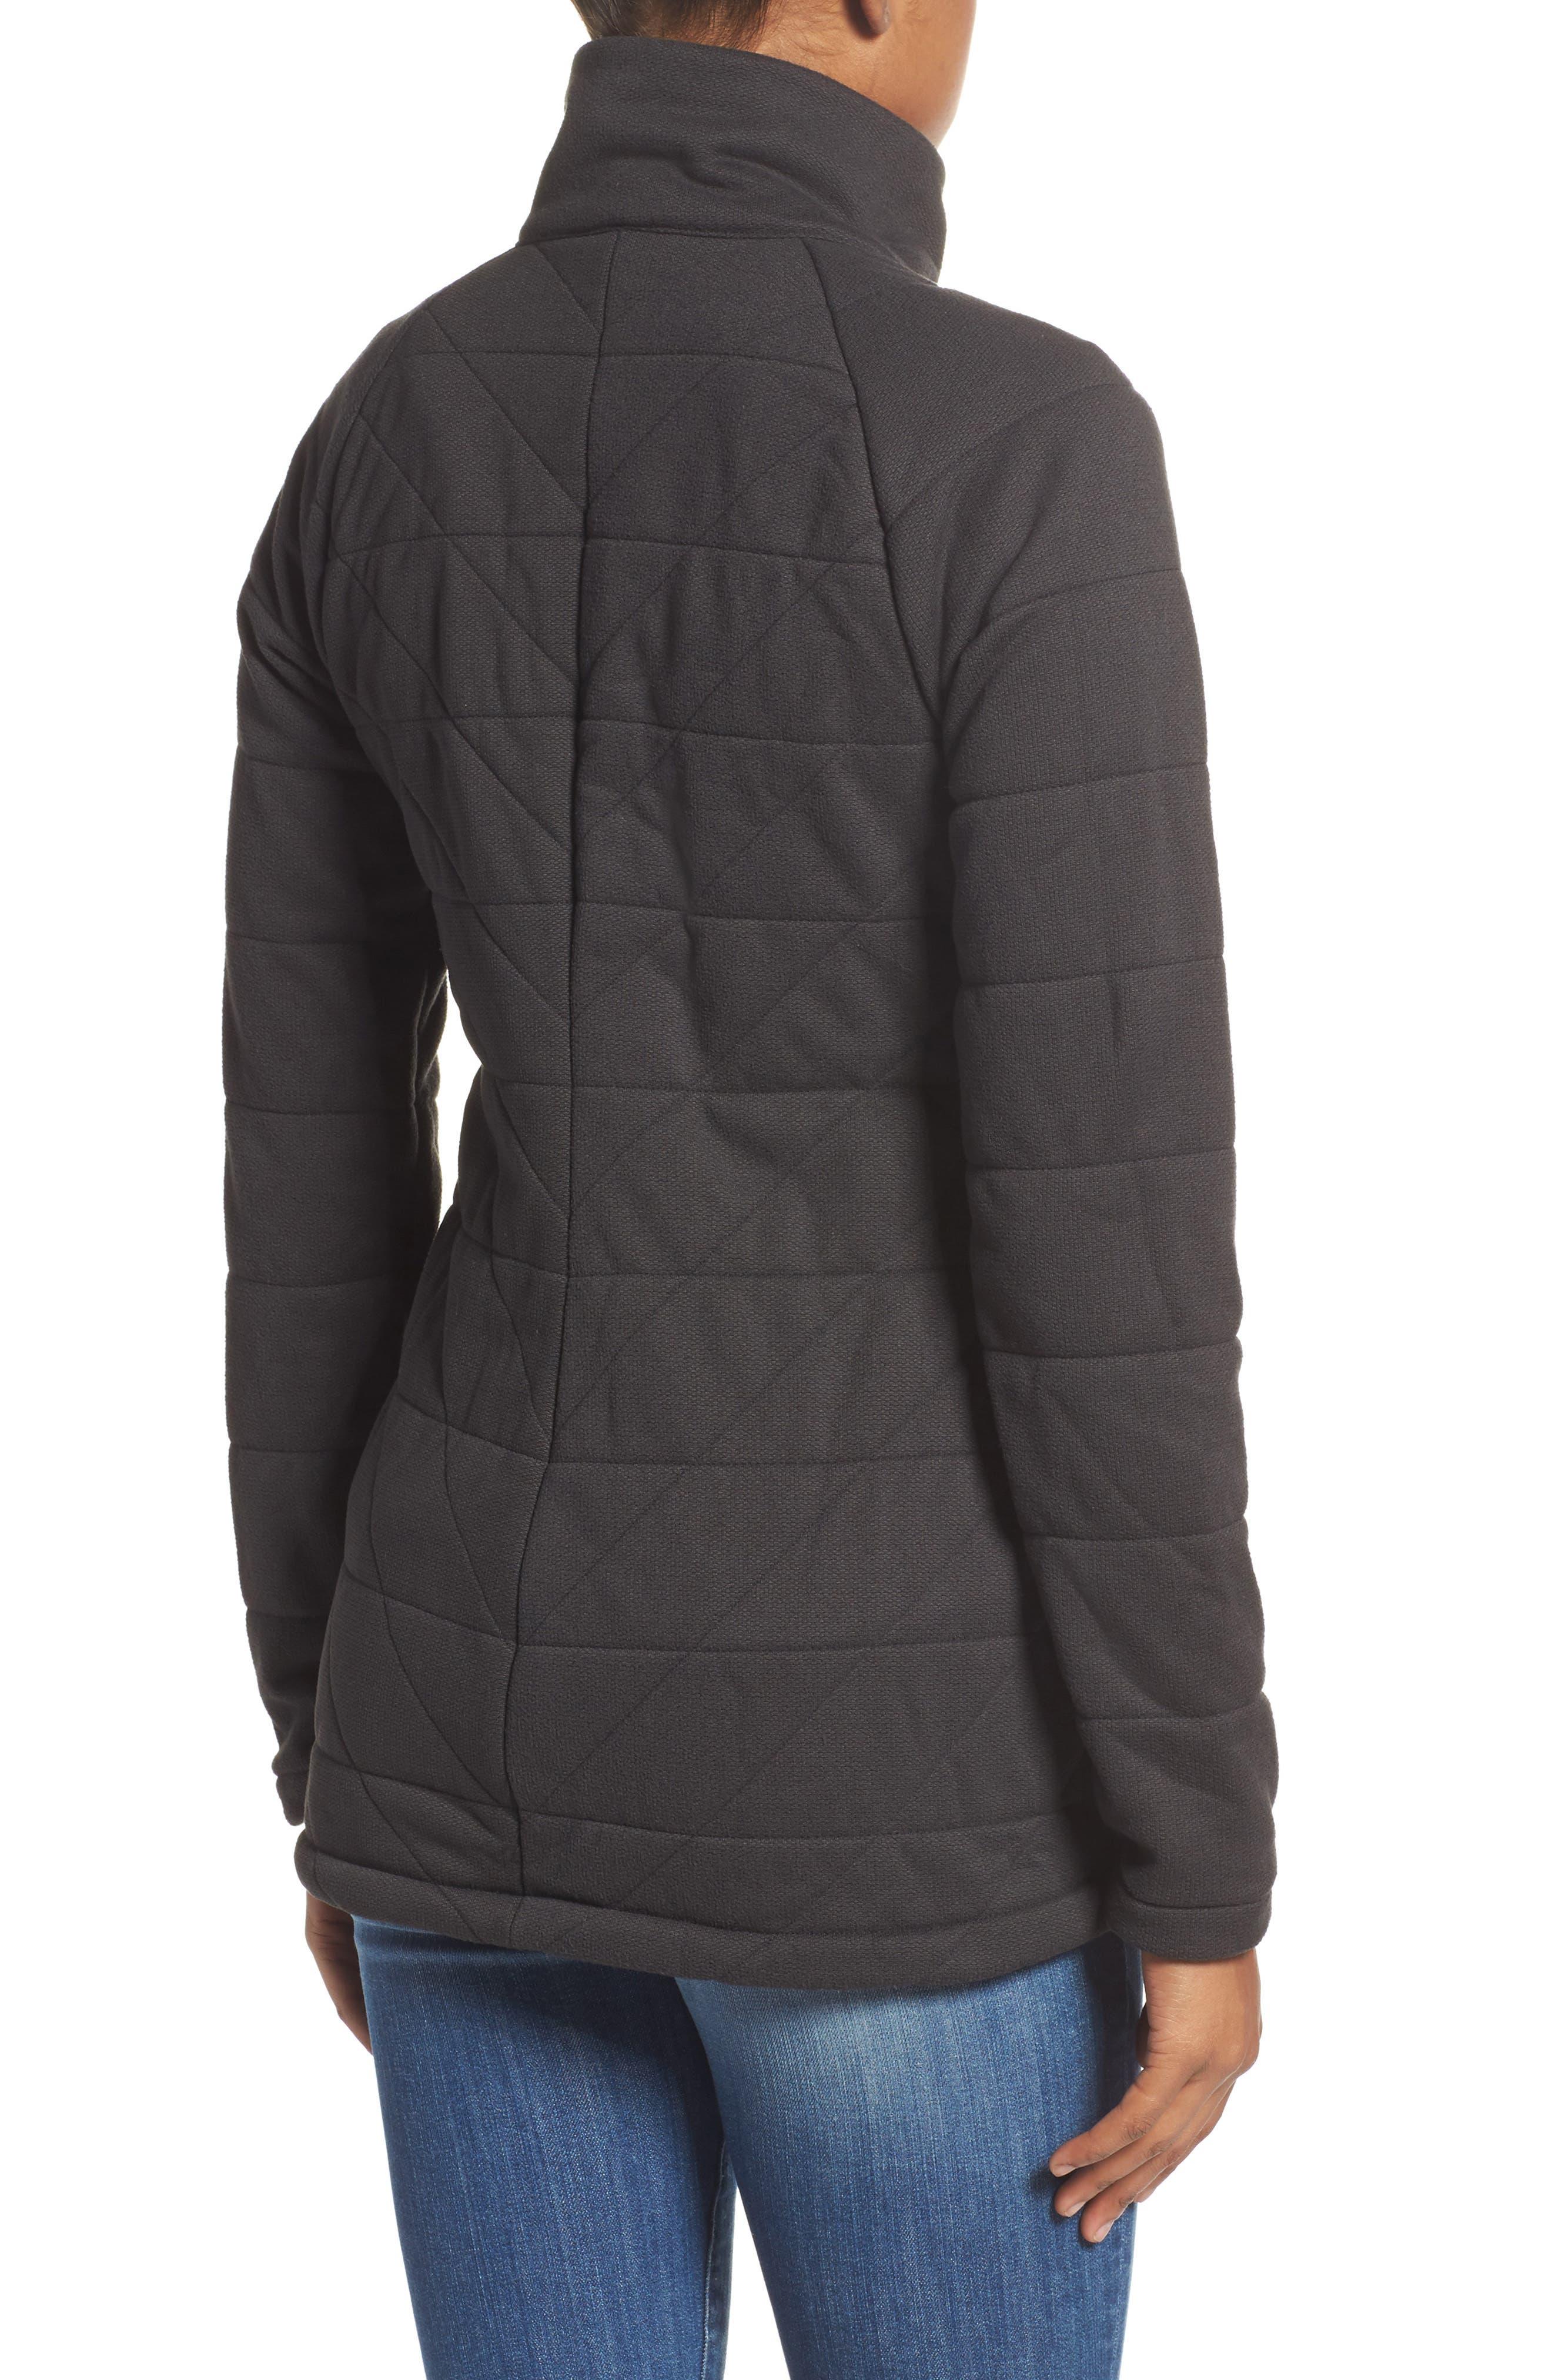 Fleece Jacket,                             Alternate thumbnail 2, color,                             001